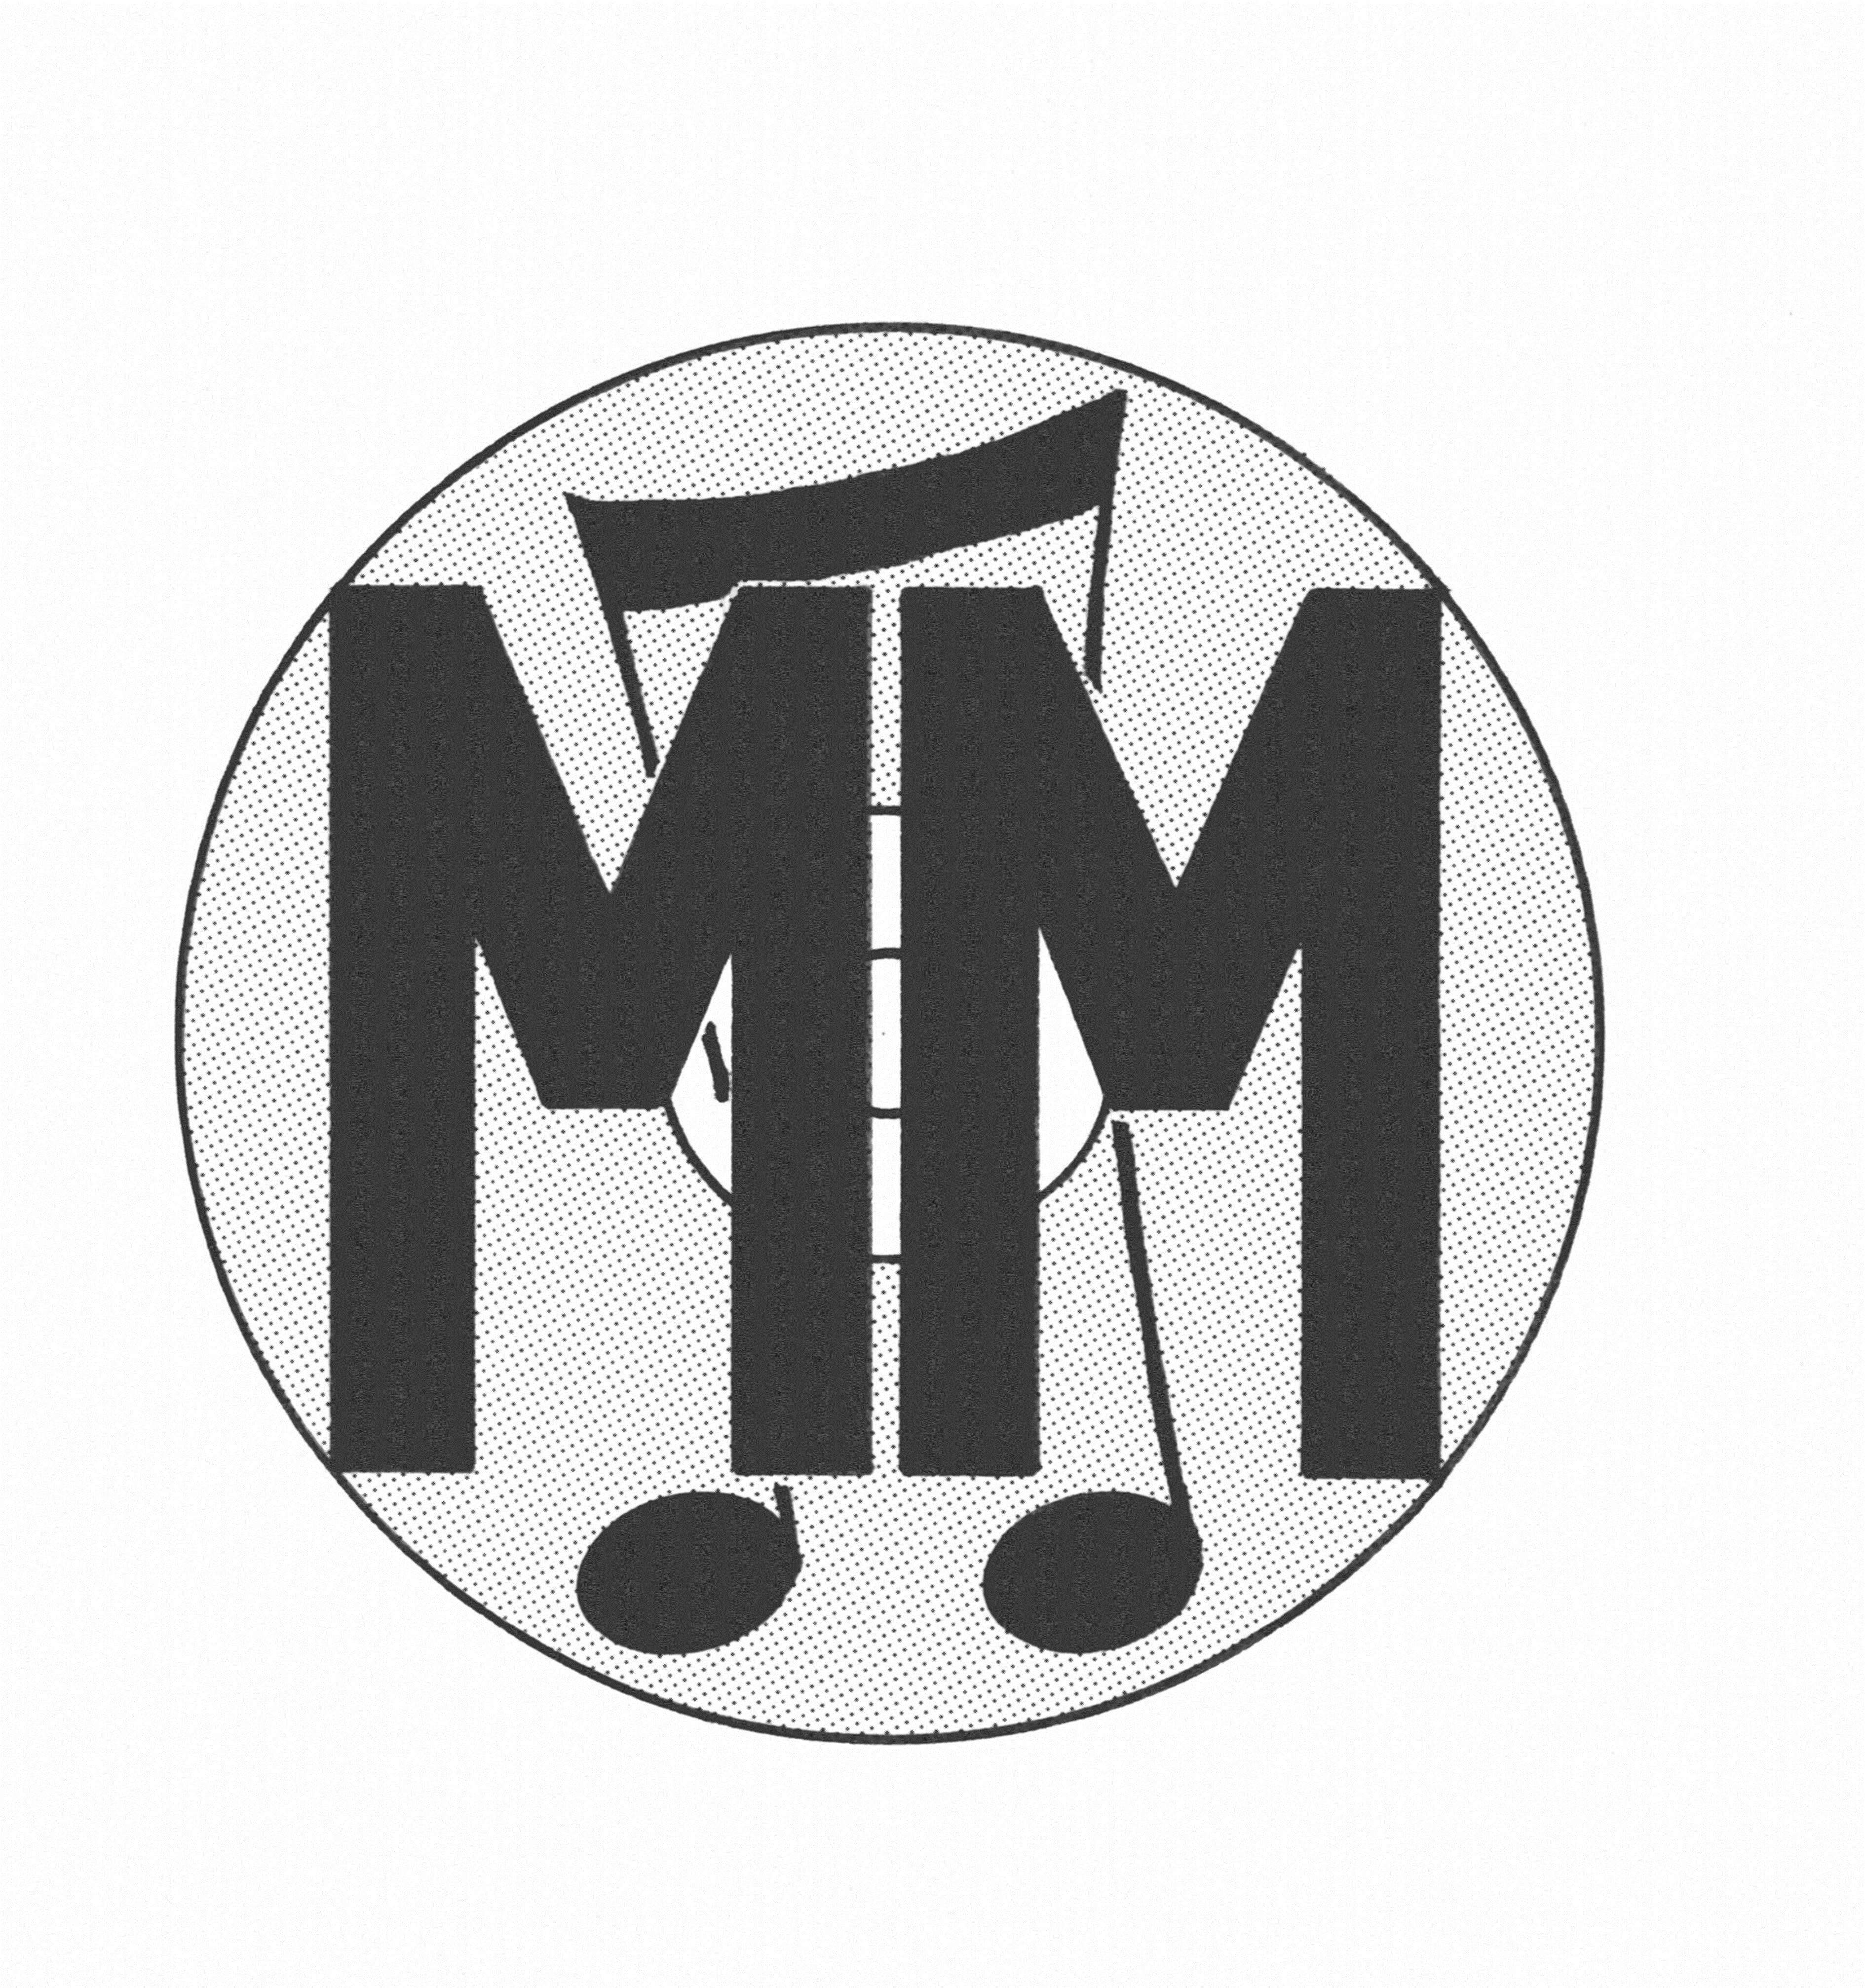 Mm logo clipart vector M M Clipart & Look At Clip Art Images - ClipartLook vector